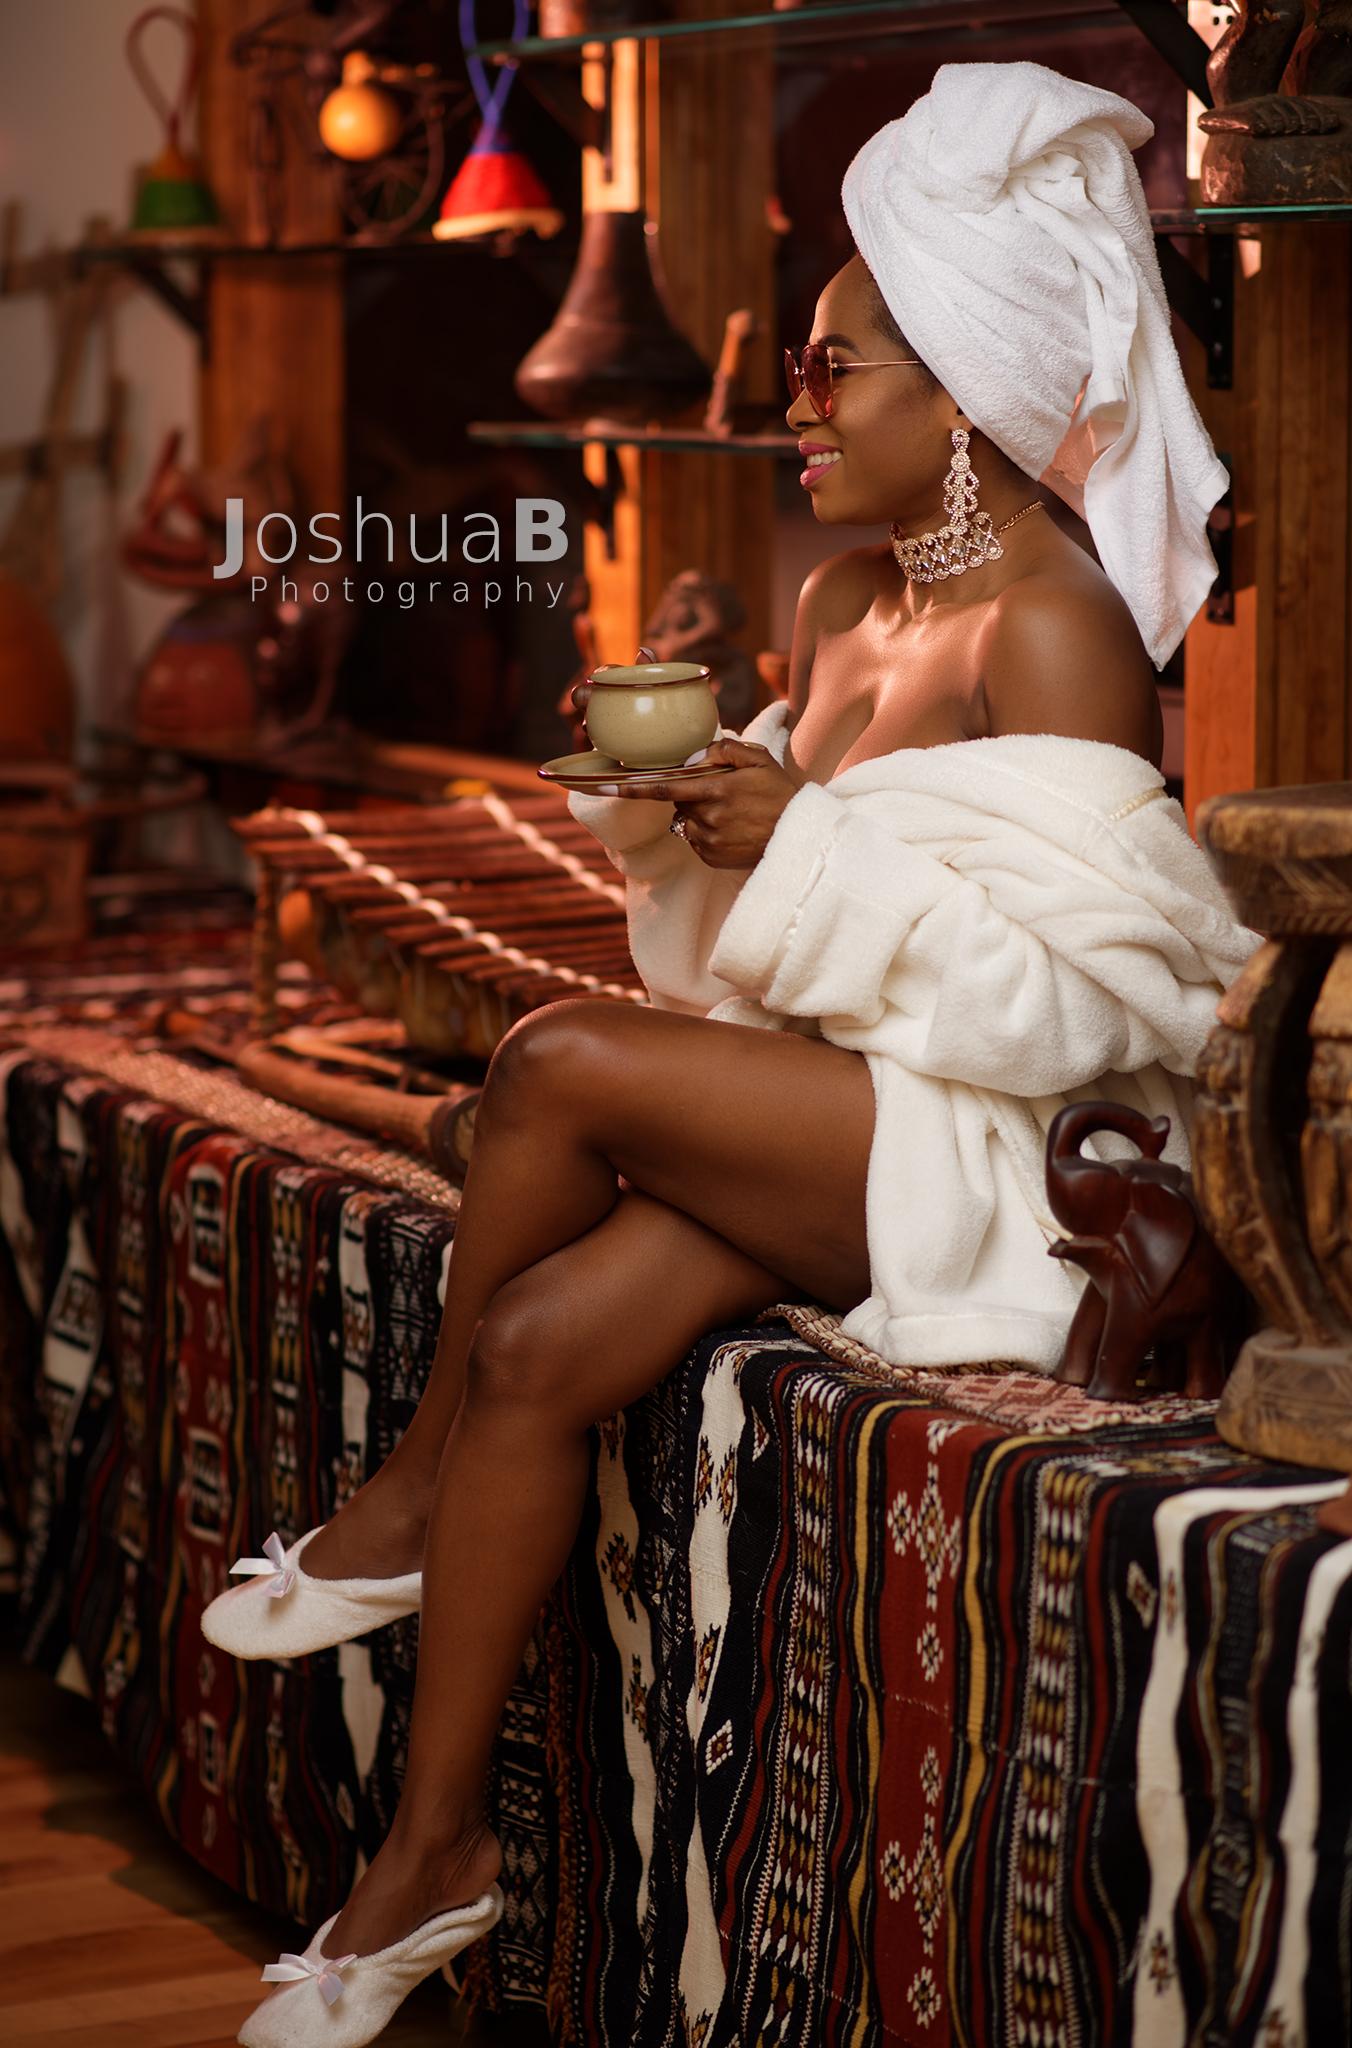 Abidemi Oke fashion blogger in white bath towels